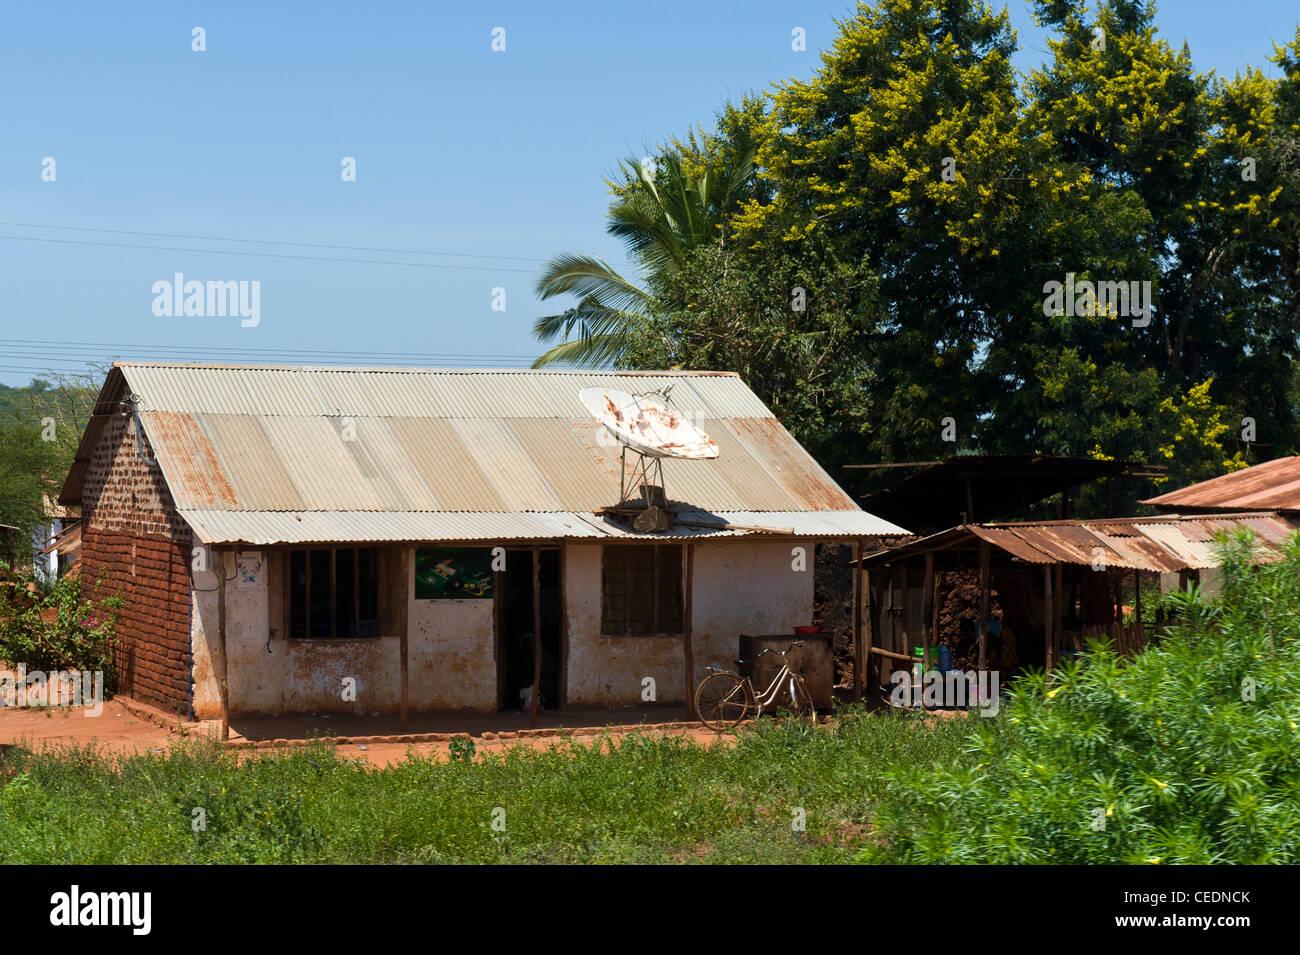 House with satellite dish Pwani Region Tanzania - Stock Image